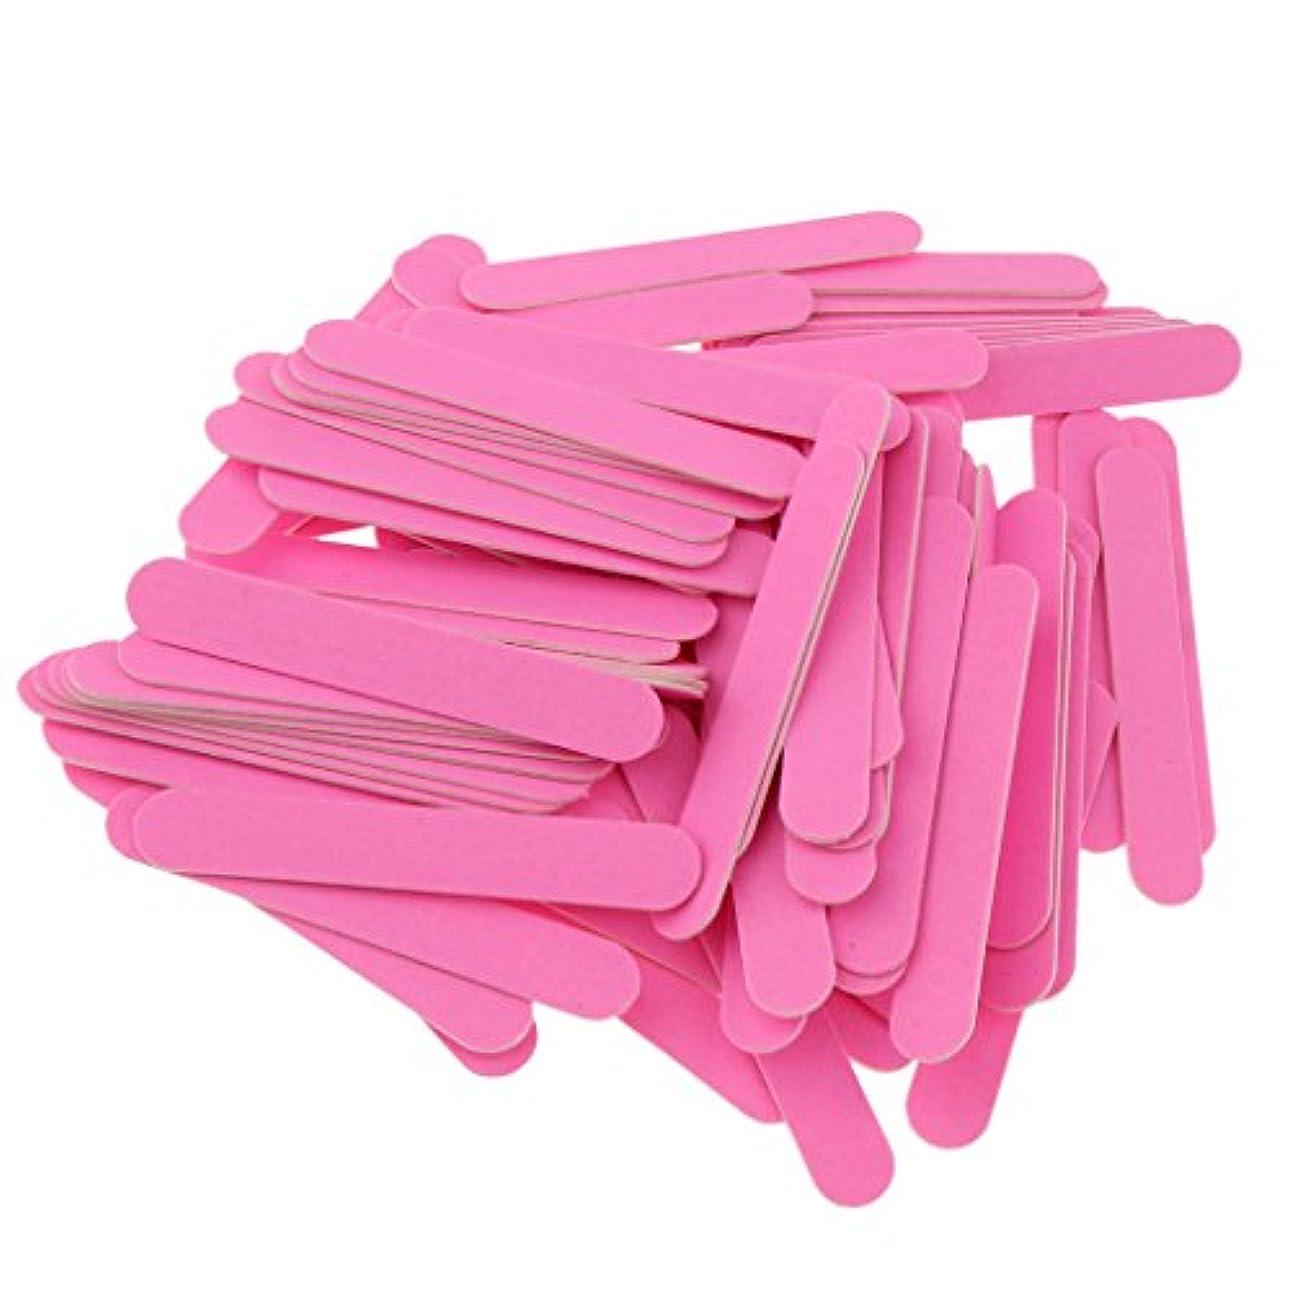 Perfeclan ネイルファイル 爪やすり ネイルバッファー 爪磨き ジェルネイル用ファイル マニキュアキット